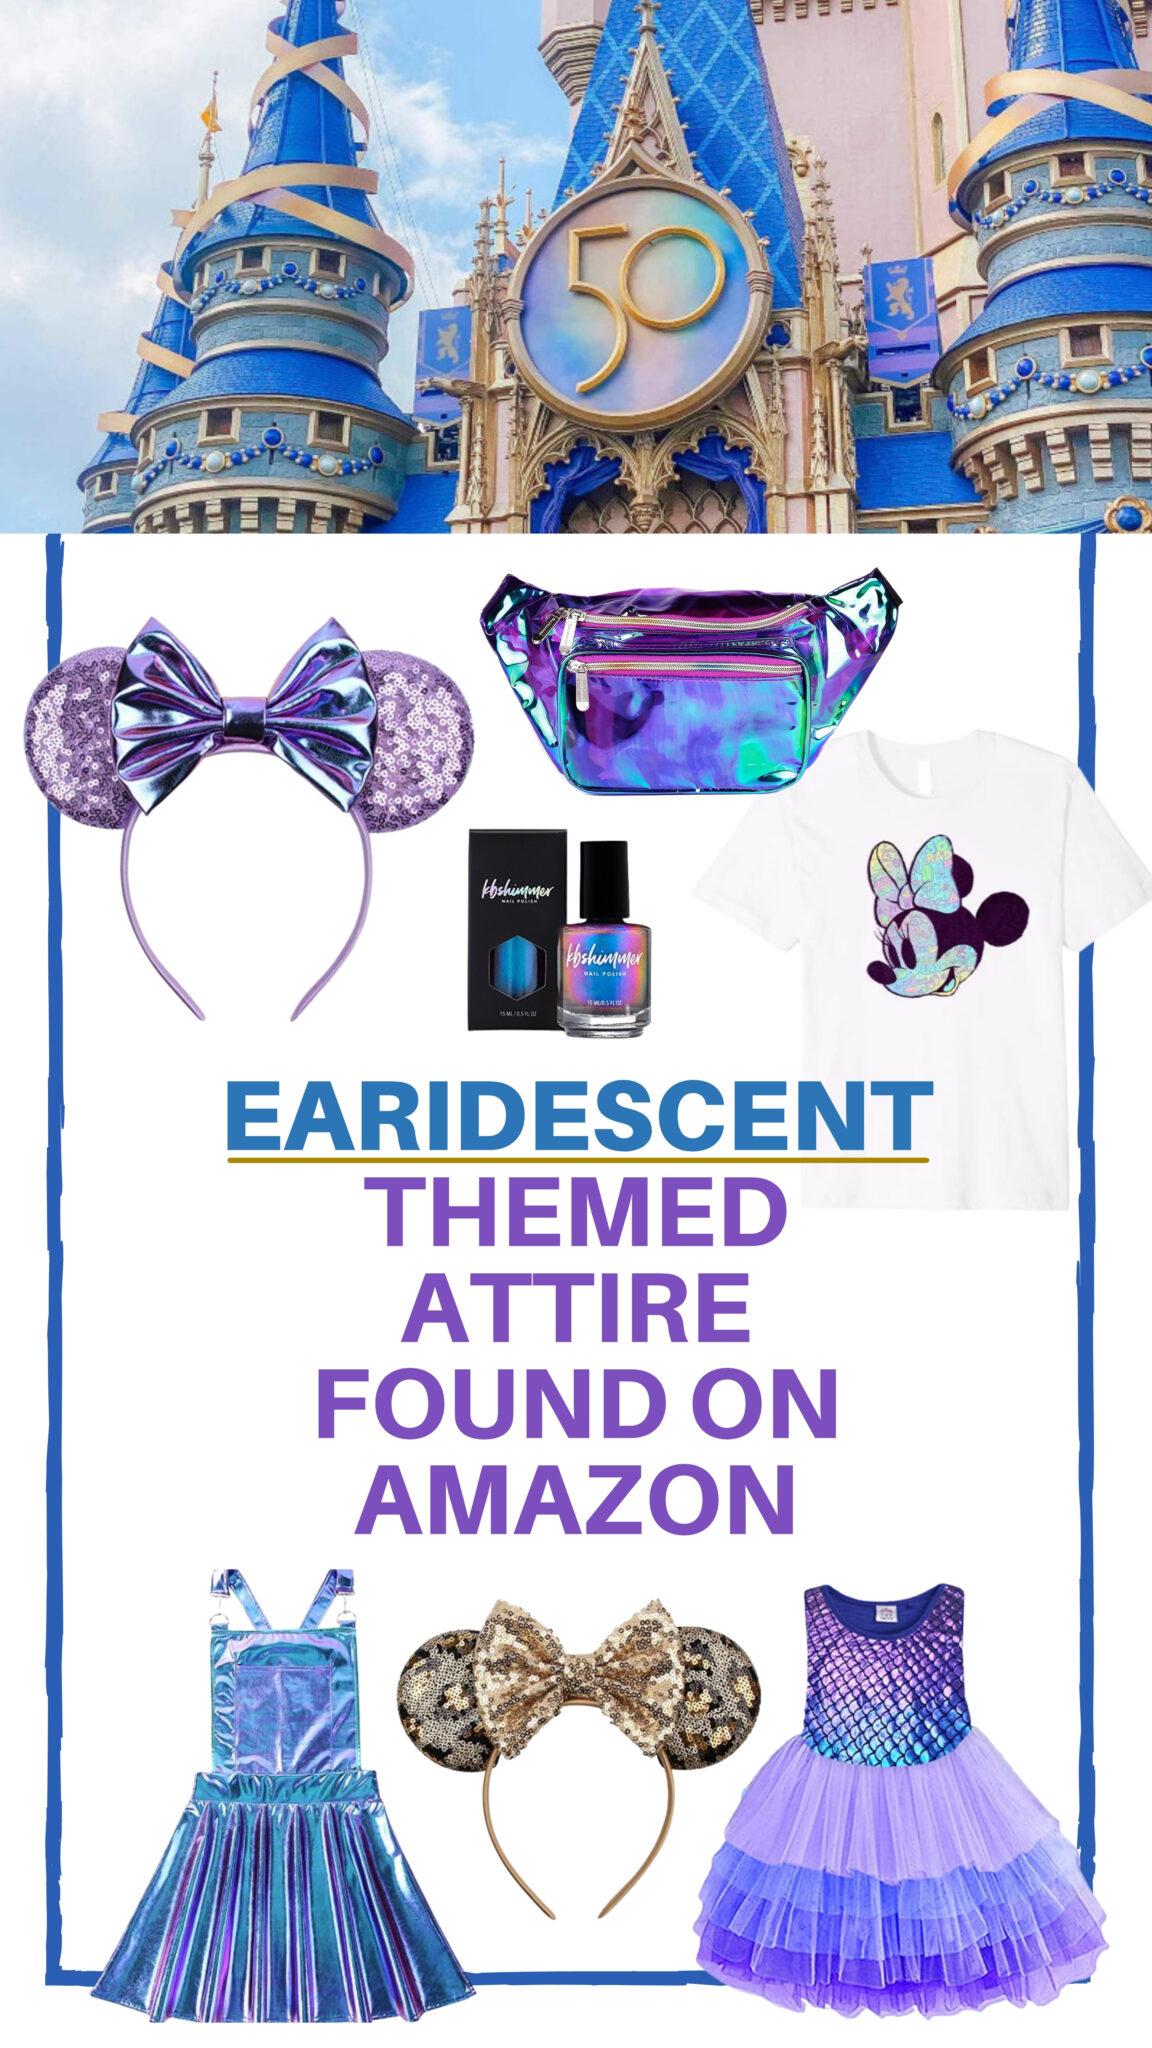 Walt Disney World 50th Anniversary Earidescent Themed Attire Found on Amazon All Things with Purpose Sarah Lemp 1